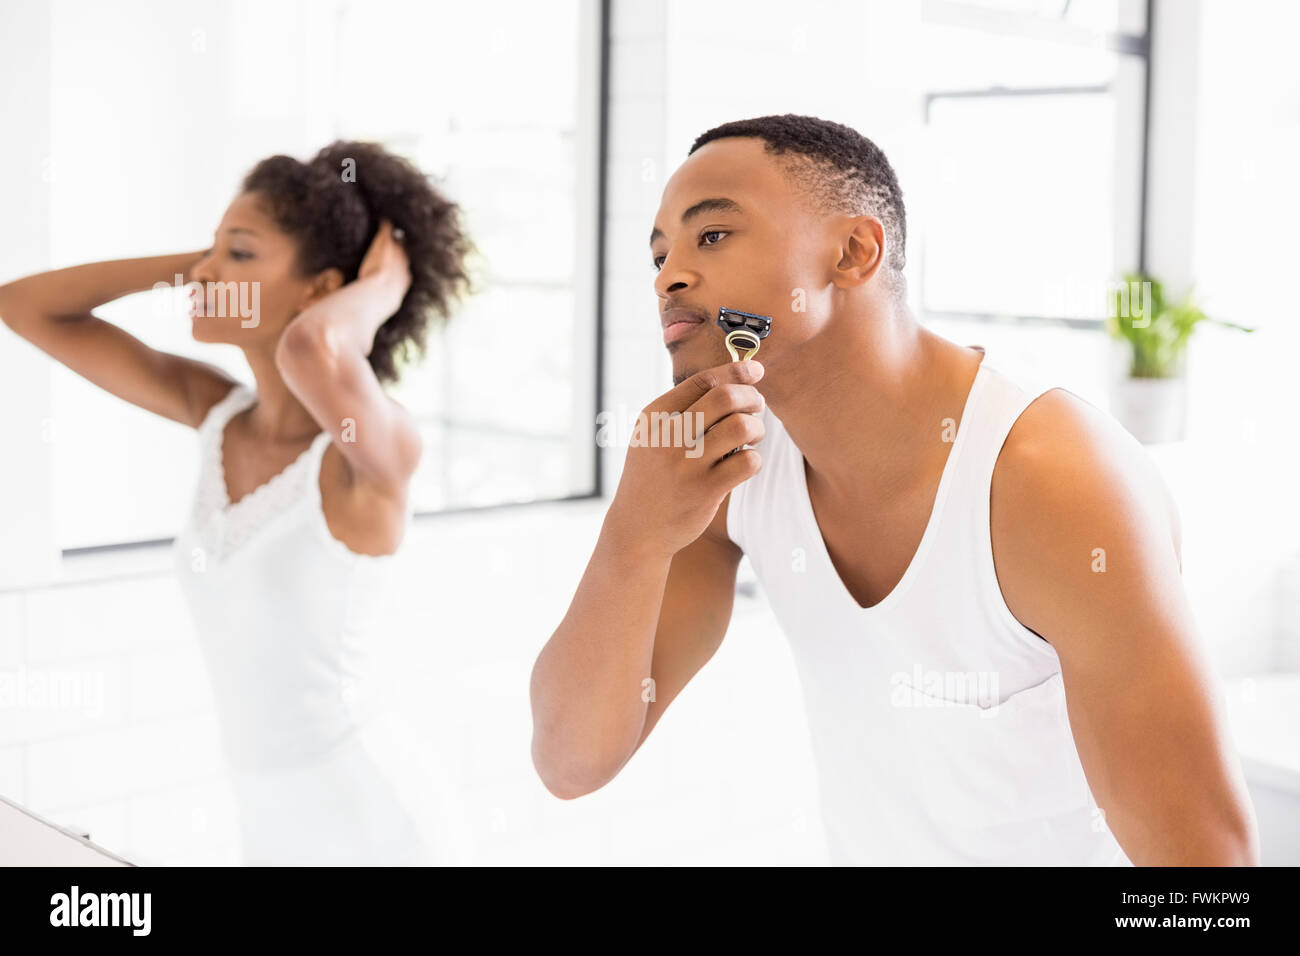 Man shaving with razor in bathroom - Stock Image